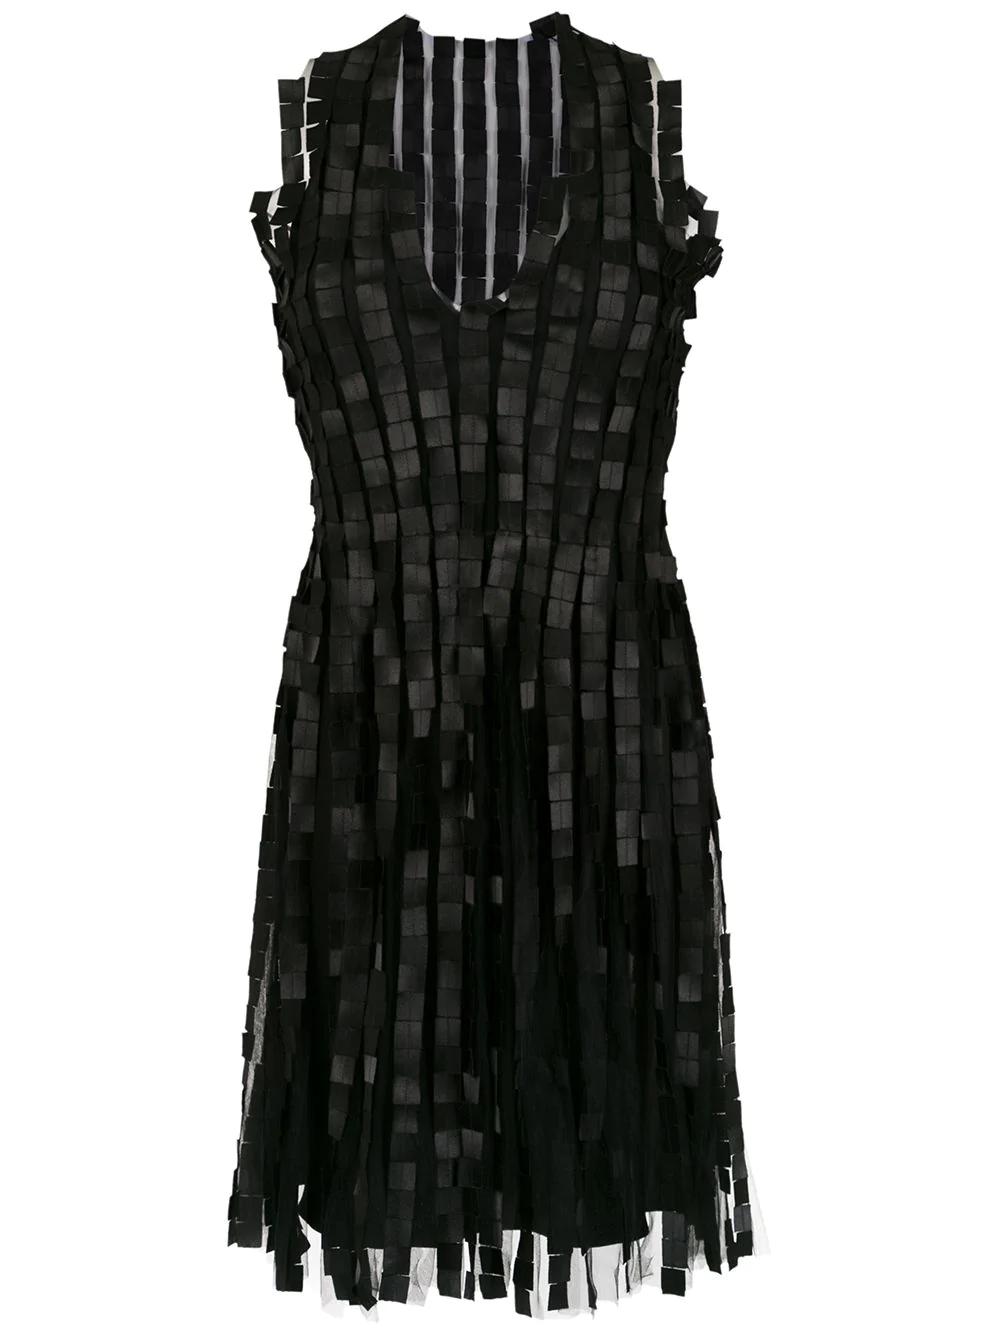 Gloria Coelho Embellished Dress - Black